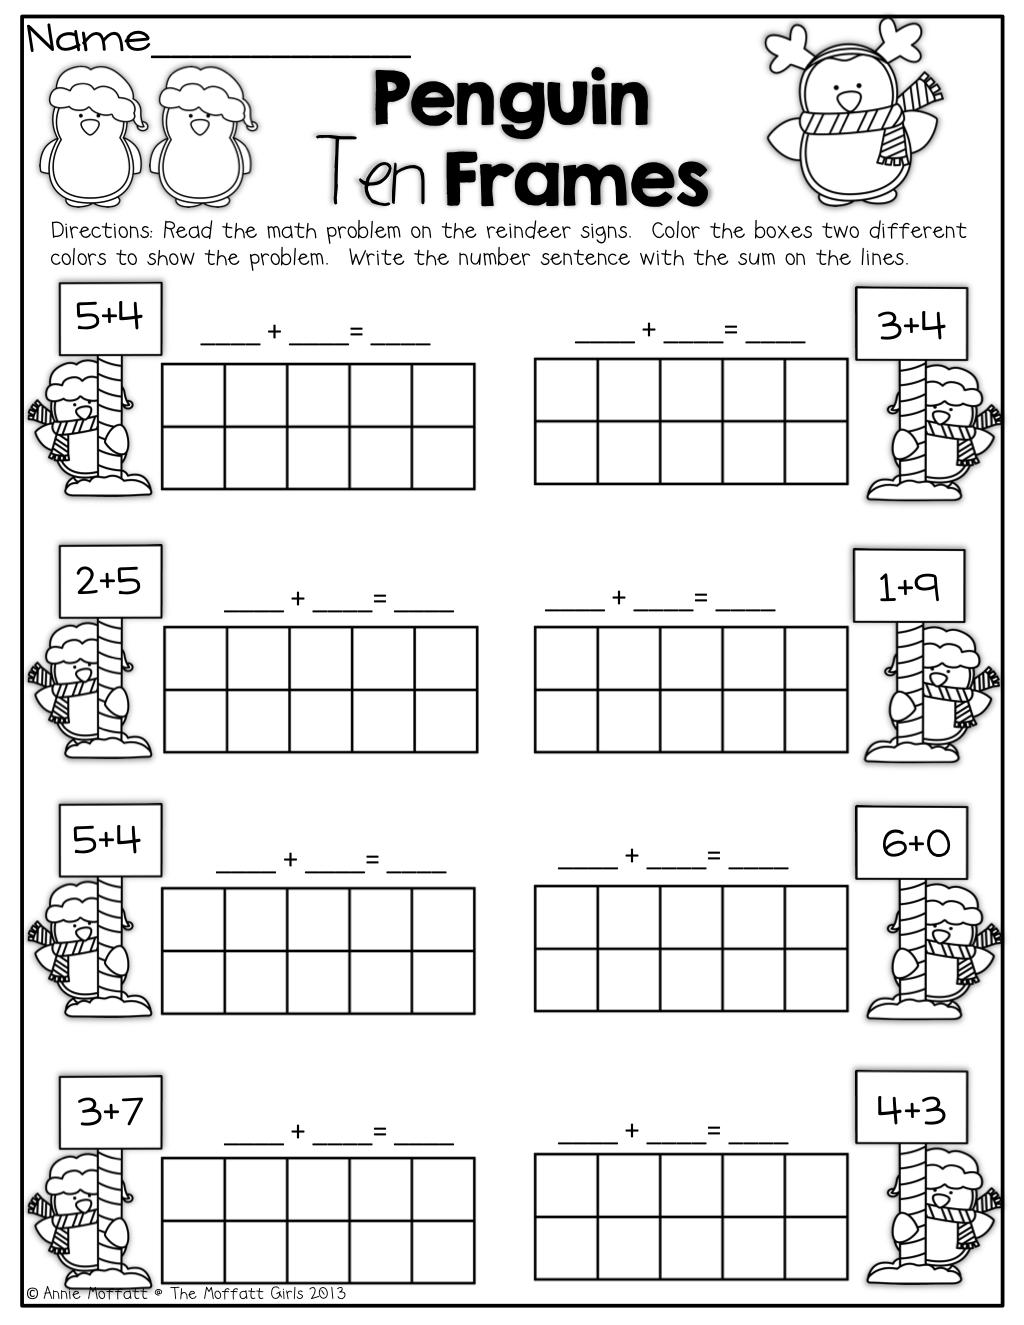 hight resolution of Penguin 10 Frames!   Math addition